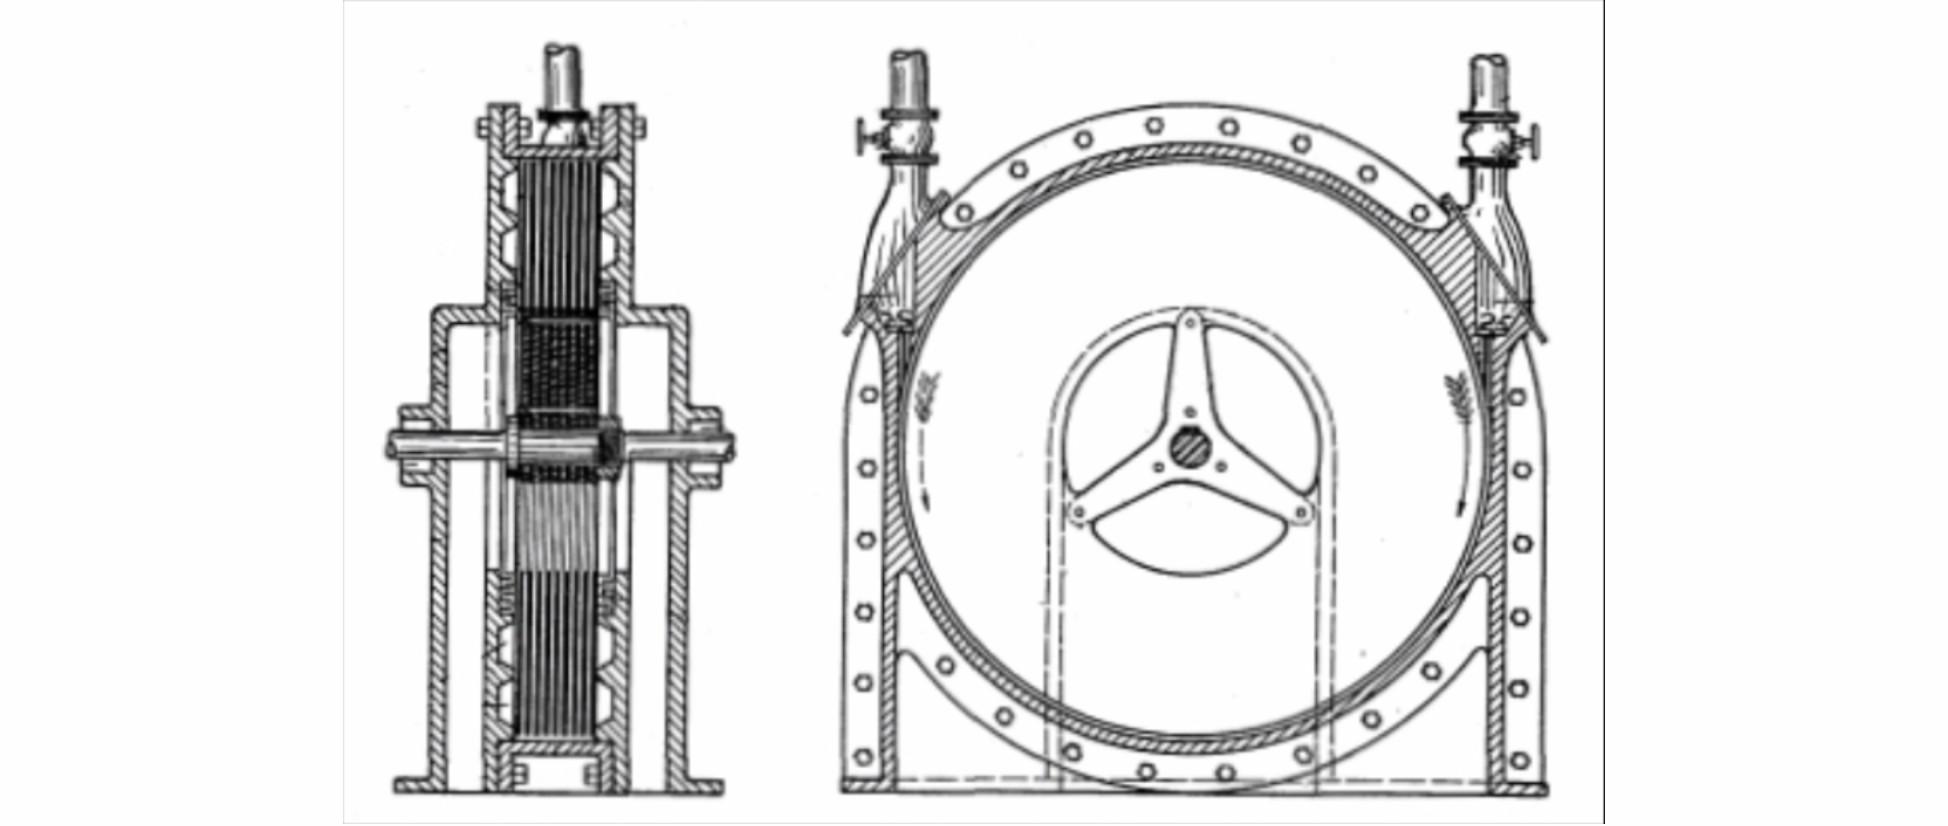 hight resolution of  ontario tesla turbine diagram u s patent 1 061 206 1909 october 21 turbine improvements in rotary engines